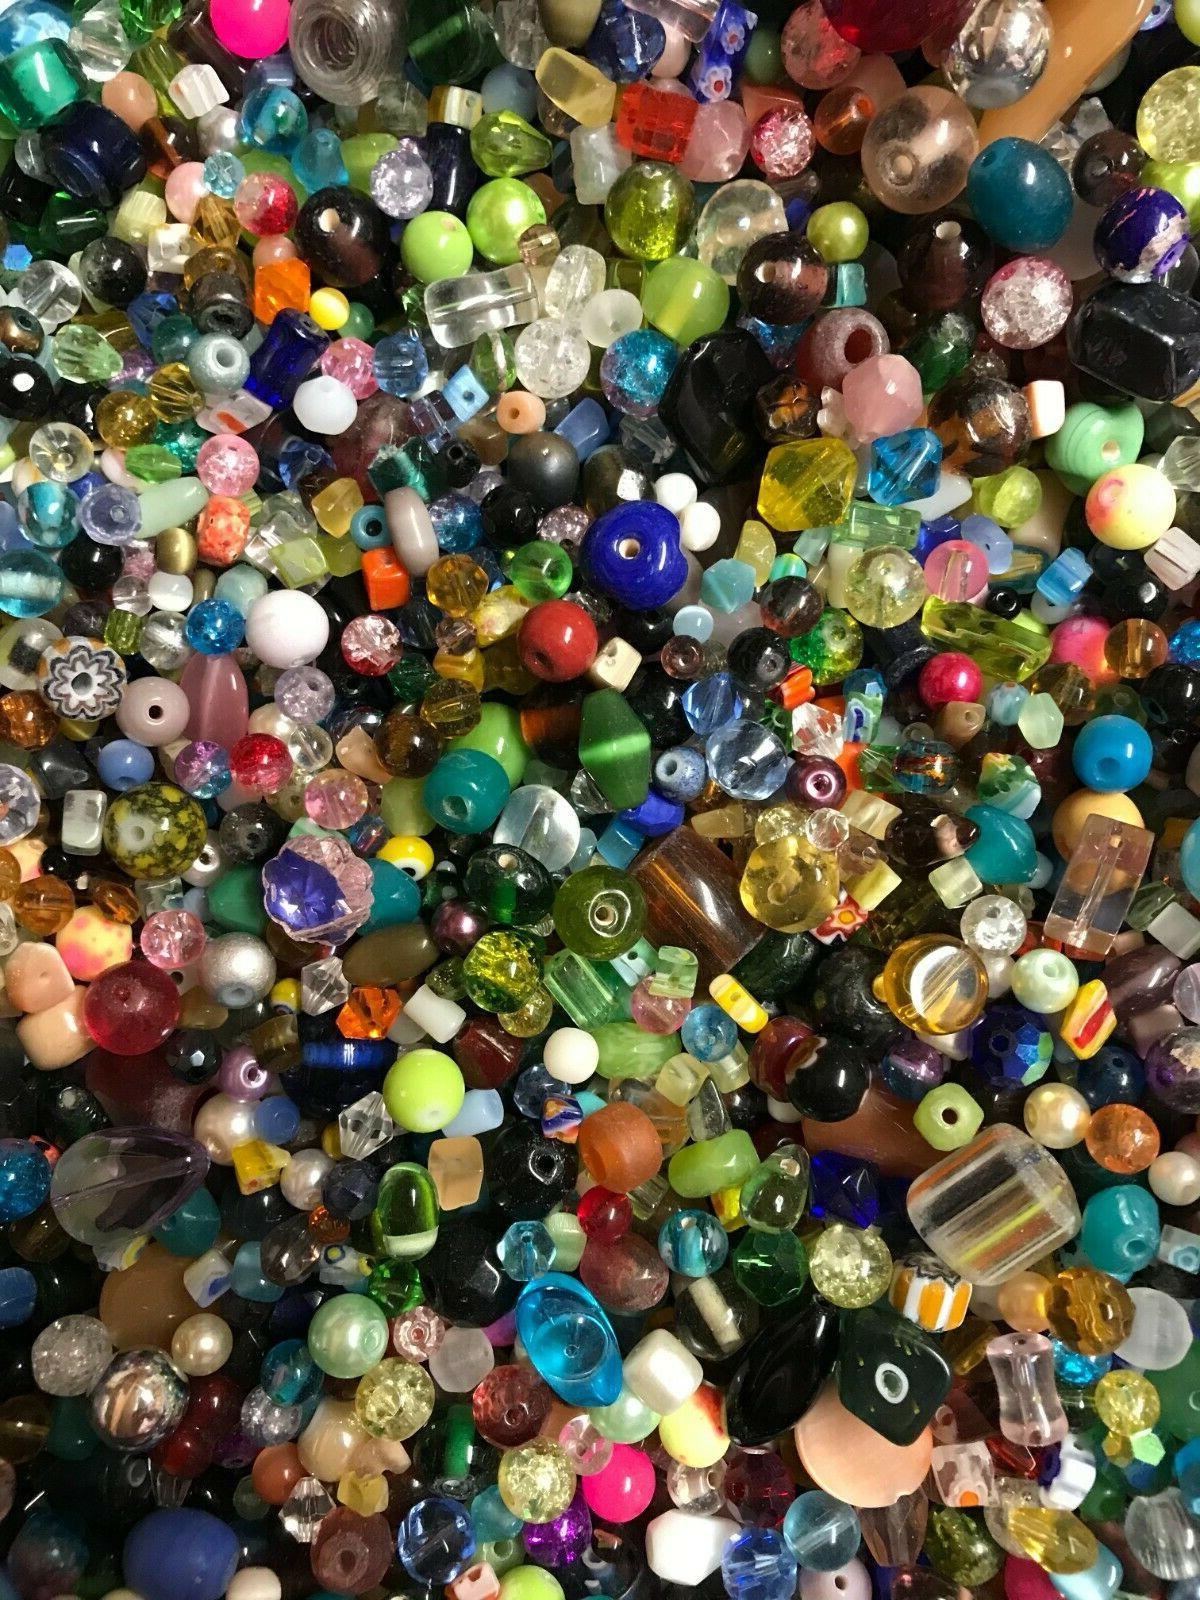 ~100~ Piece Beads Lot Craft